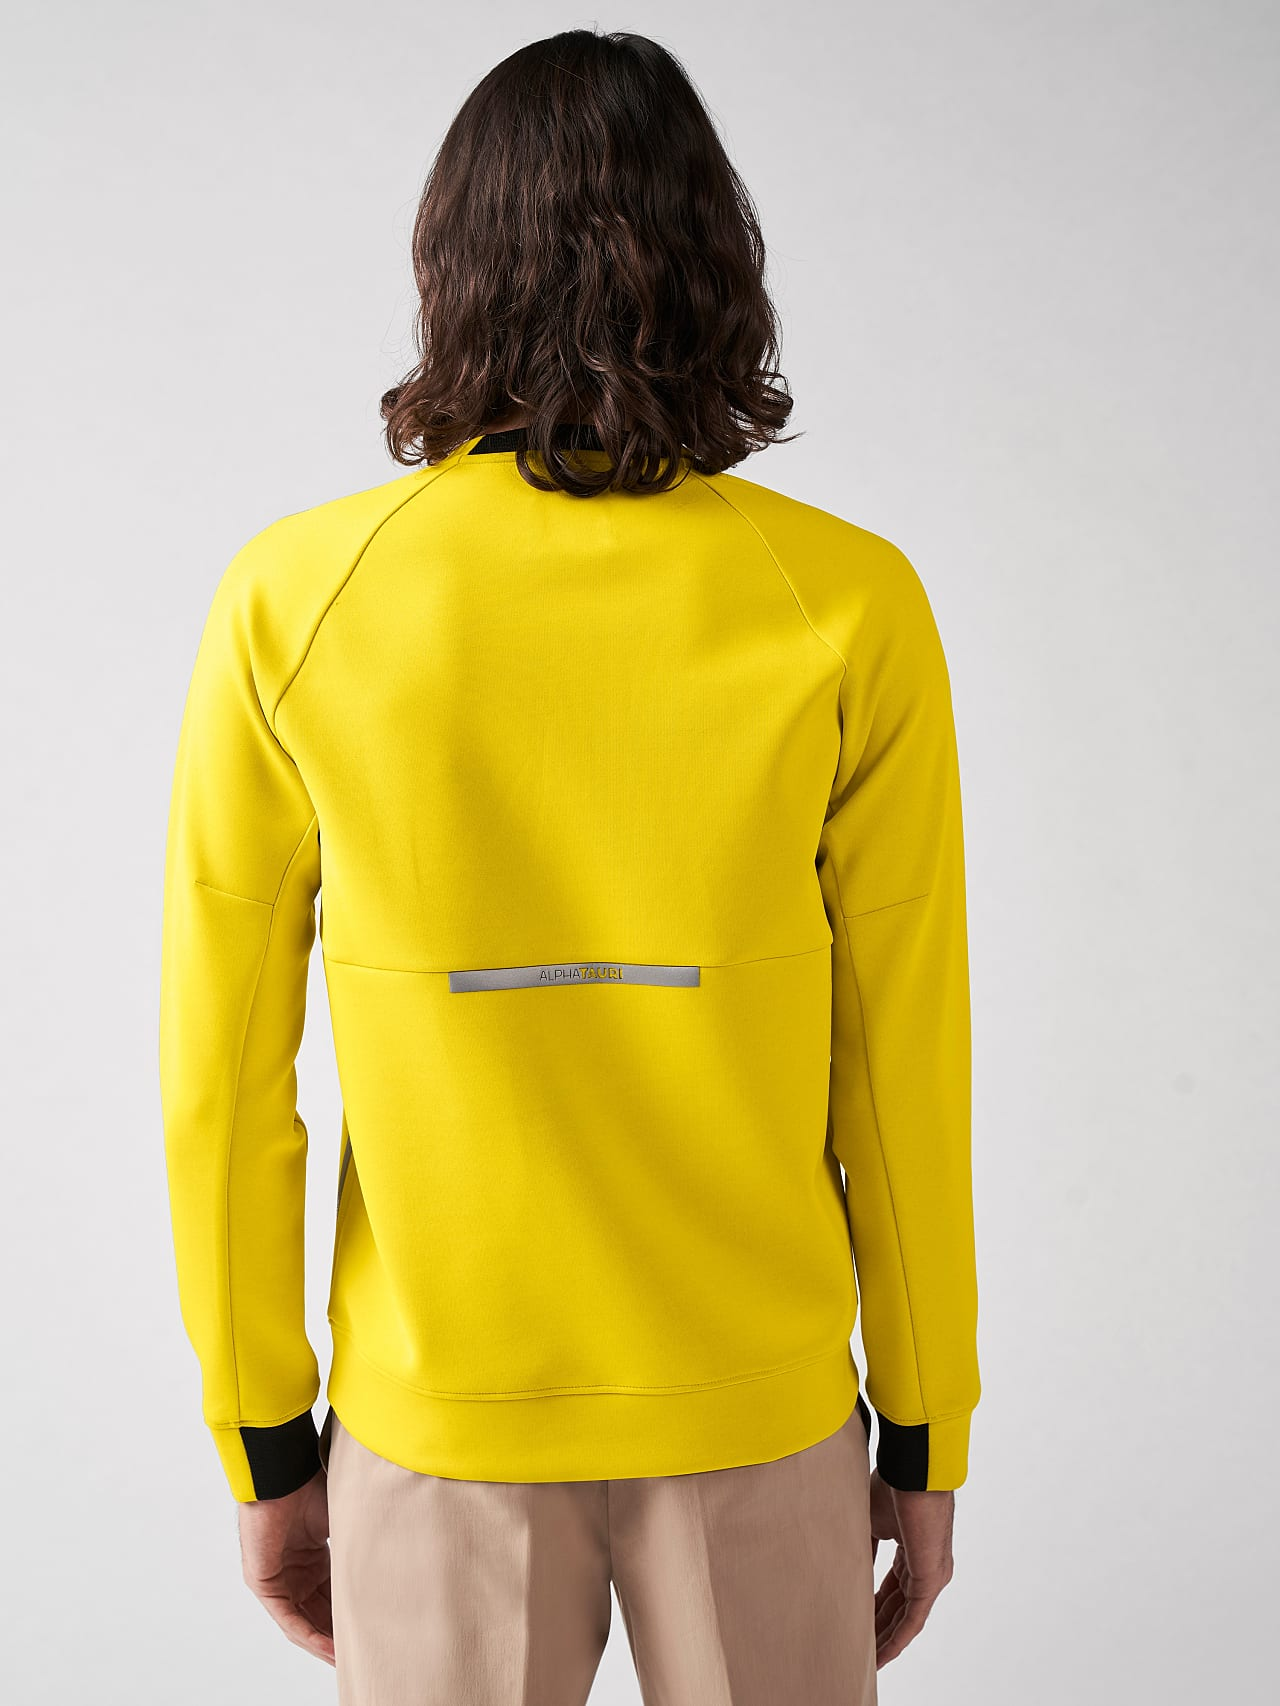 SUPRA V3.Y5.01 Technical Crewneck Sweater yellow Front Main Alpha Tauri